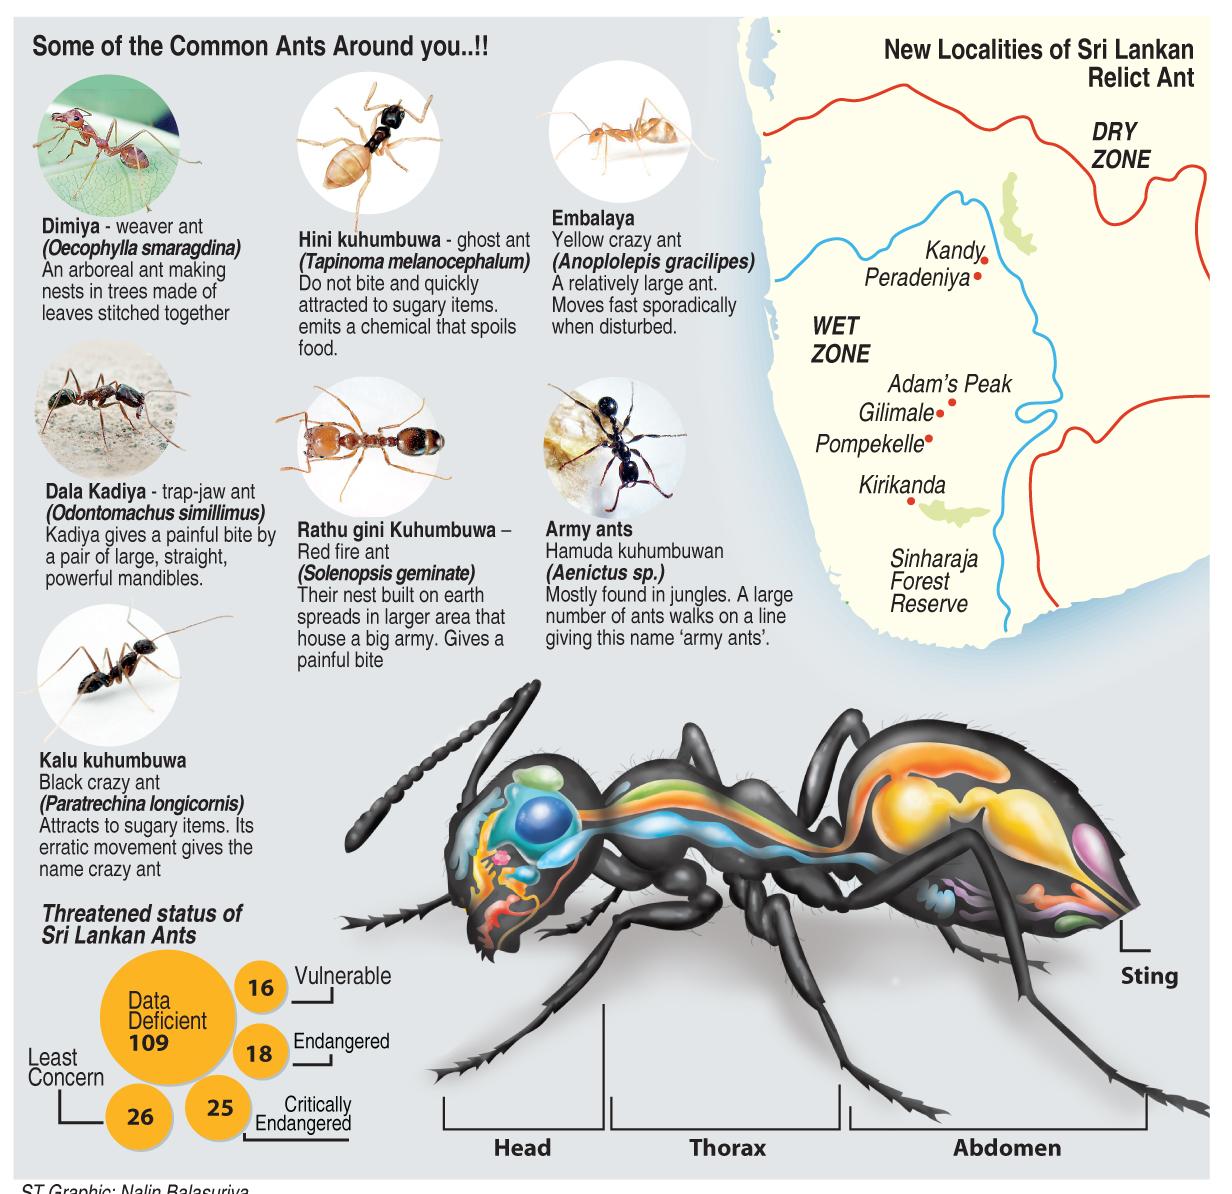 Dengue Fever: Cause, Symptoms and Home Remedies